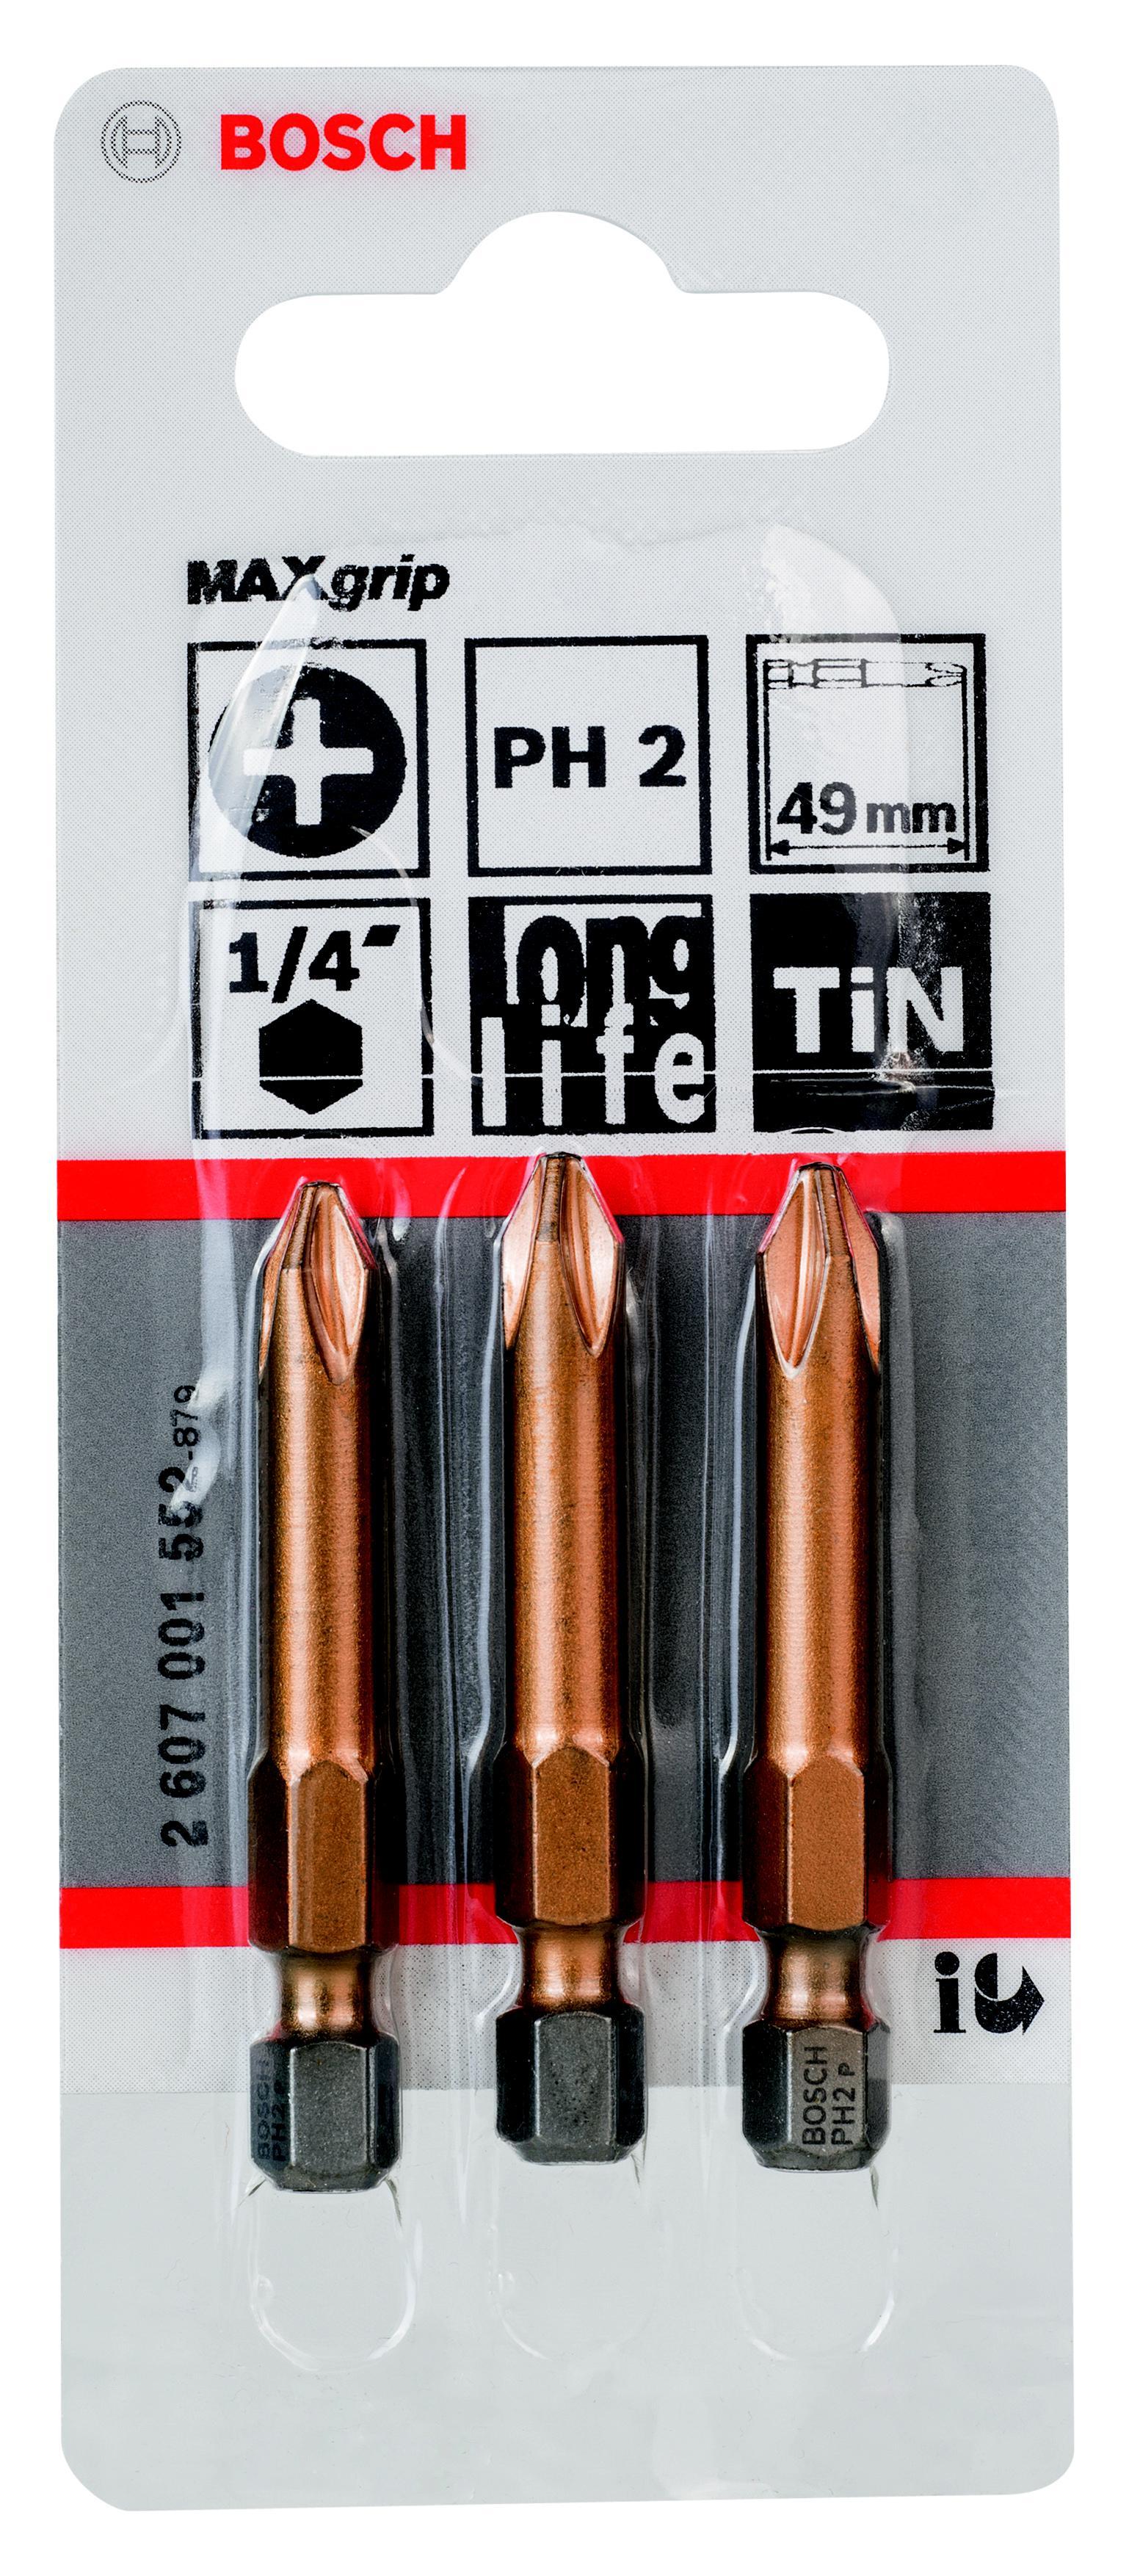 Бита Bosch Maxgrip ph2 49 мм, 3 шт. (2.607.001.552) бита рz1 49 мм 3 шт bosch профи